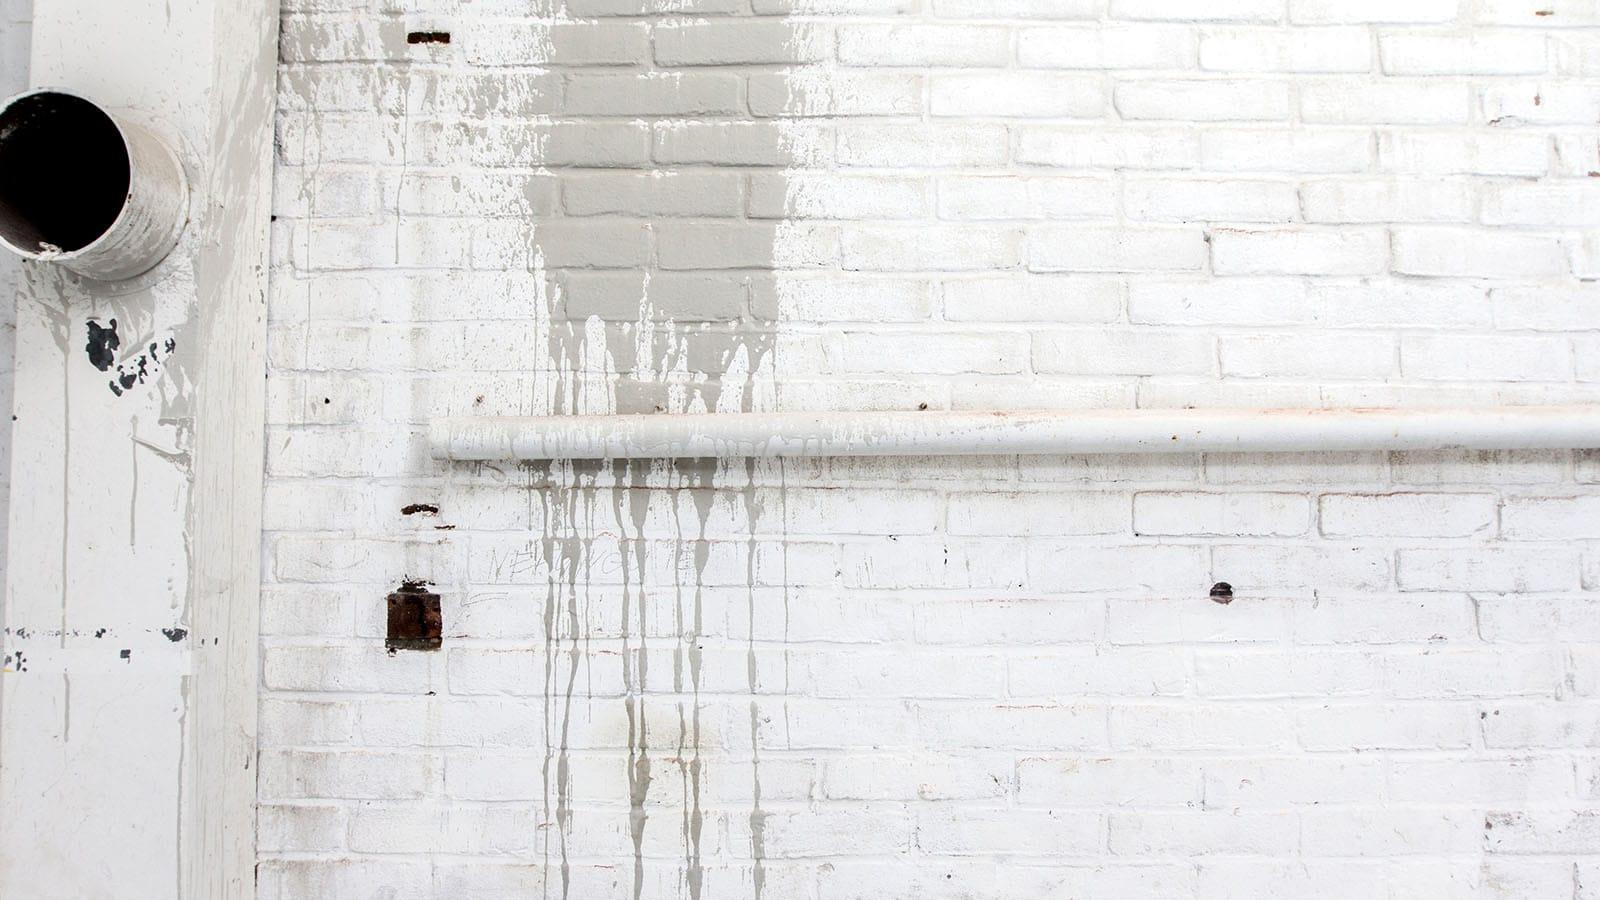 Studio industrial wall